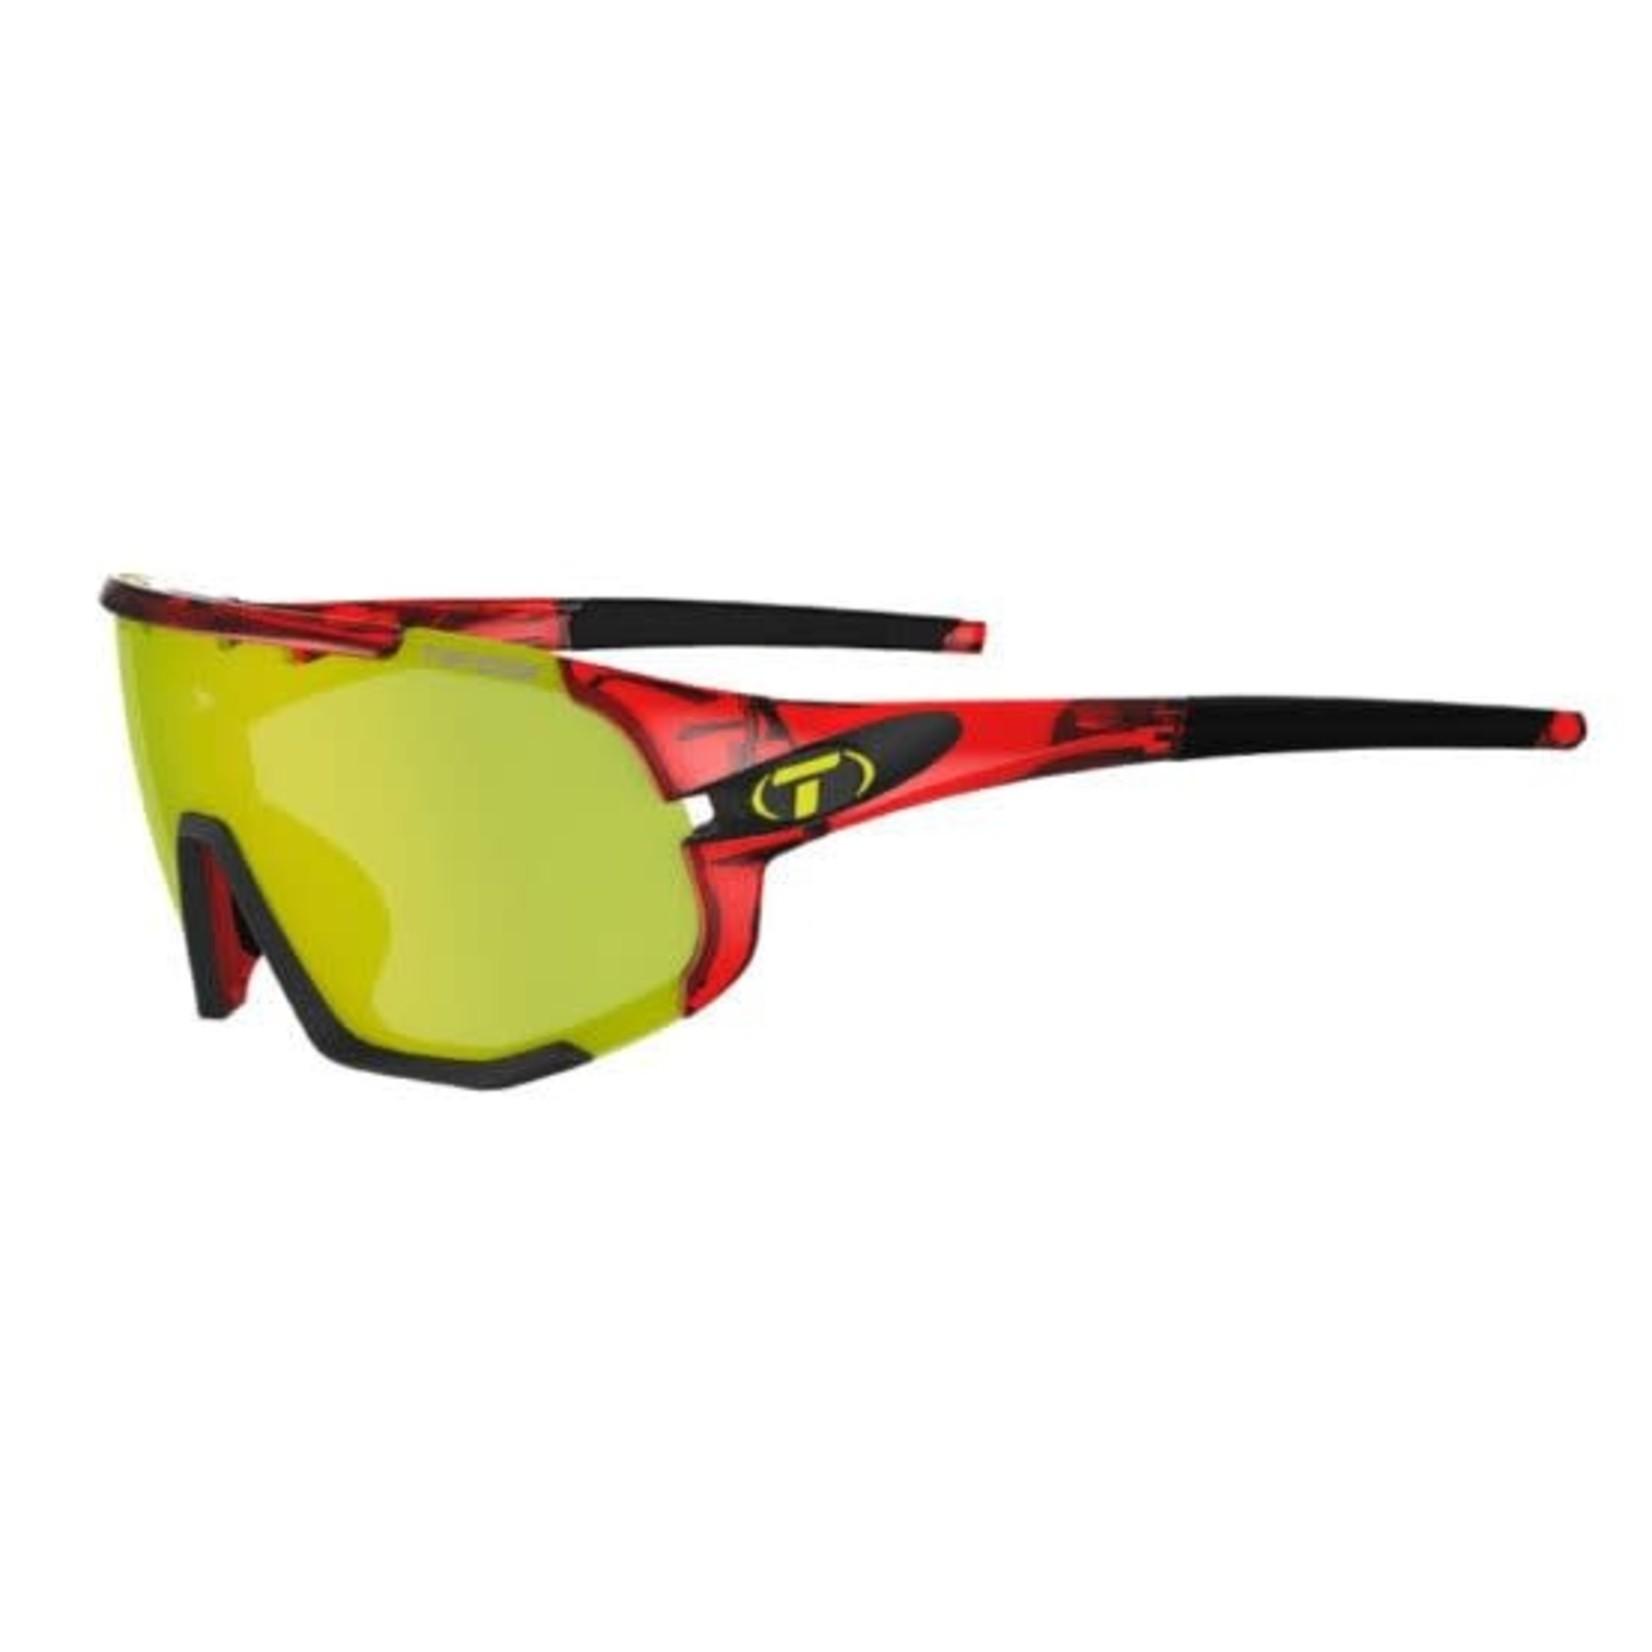 Tifosi Optics Sledge, Crystal Red Interchangeable Sunglasses